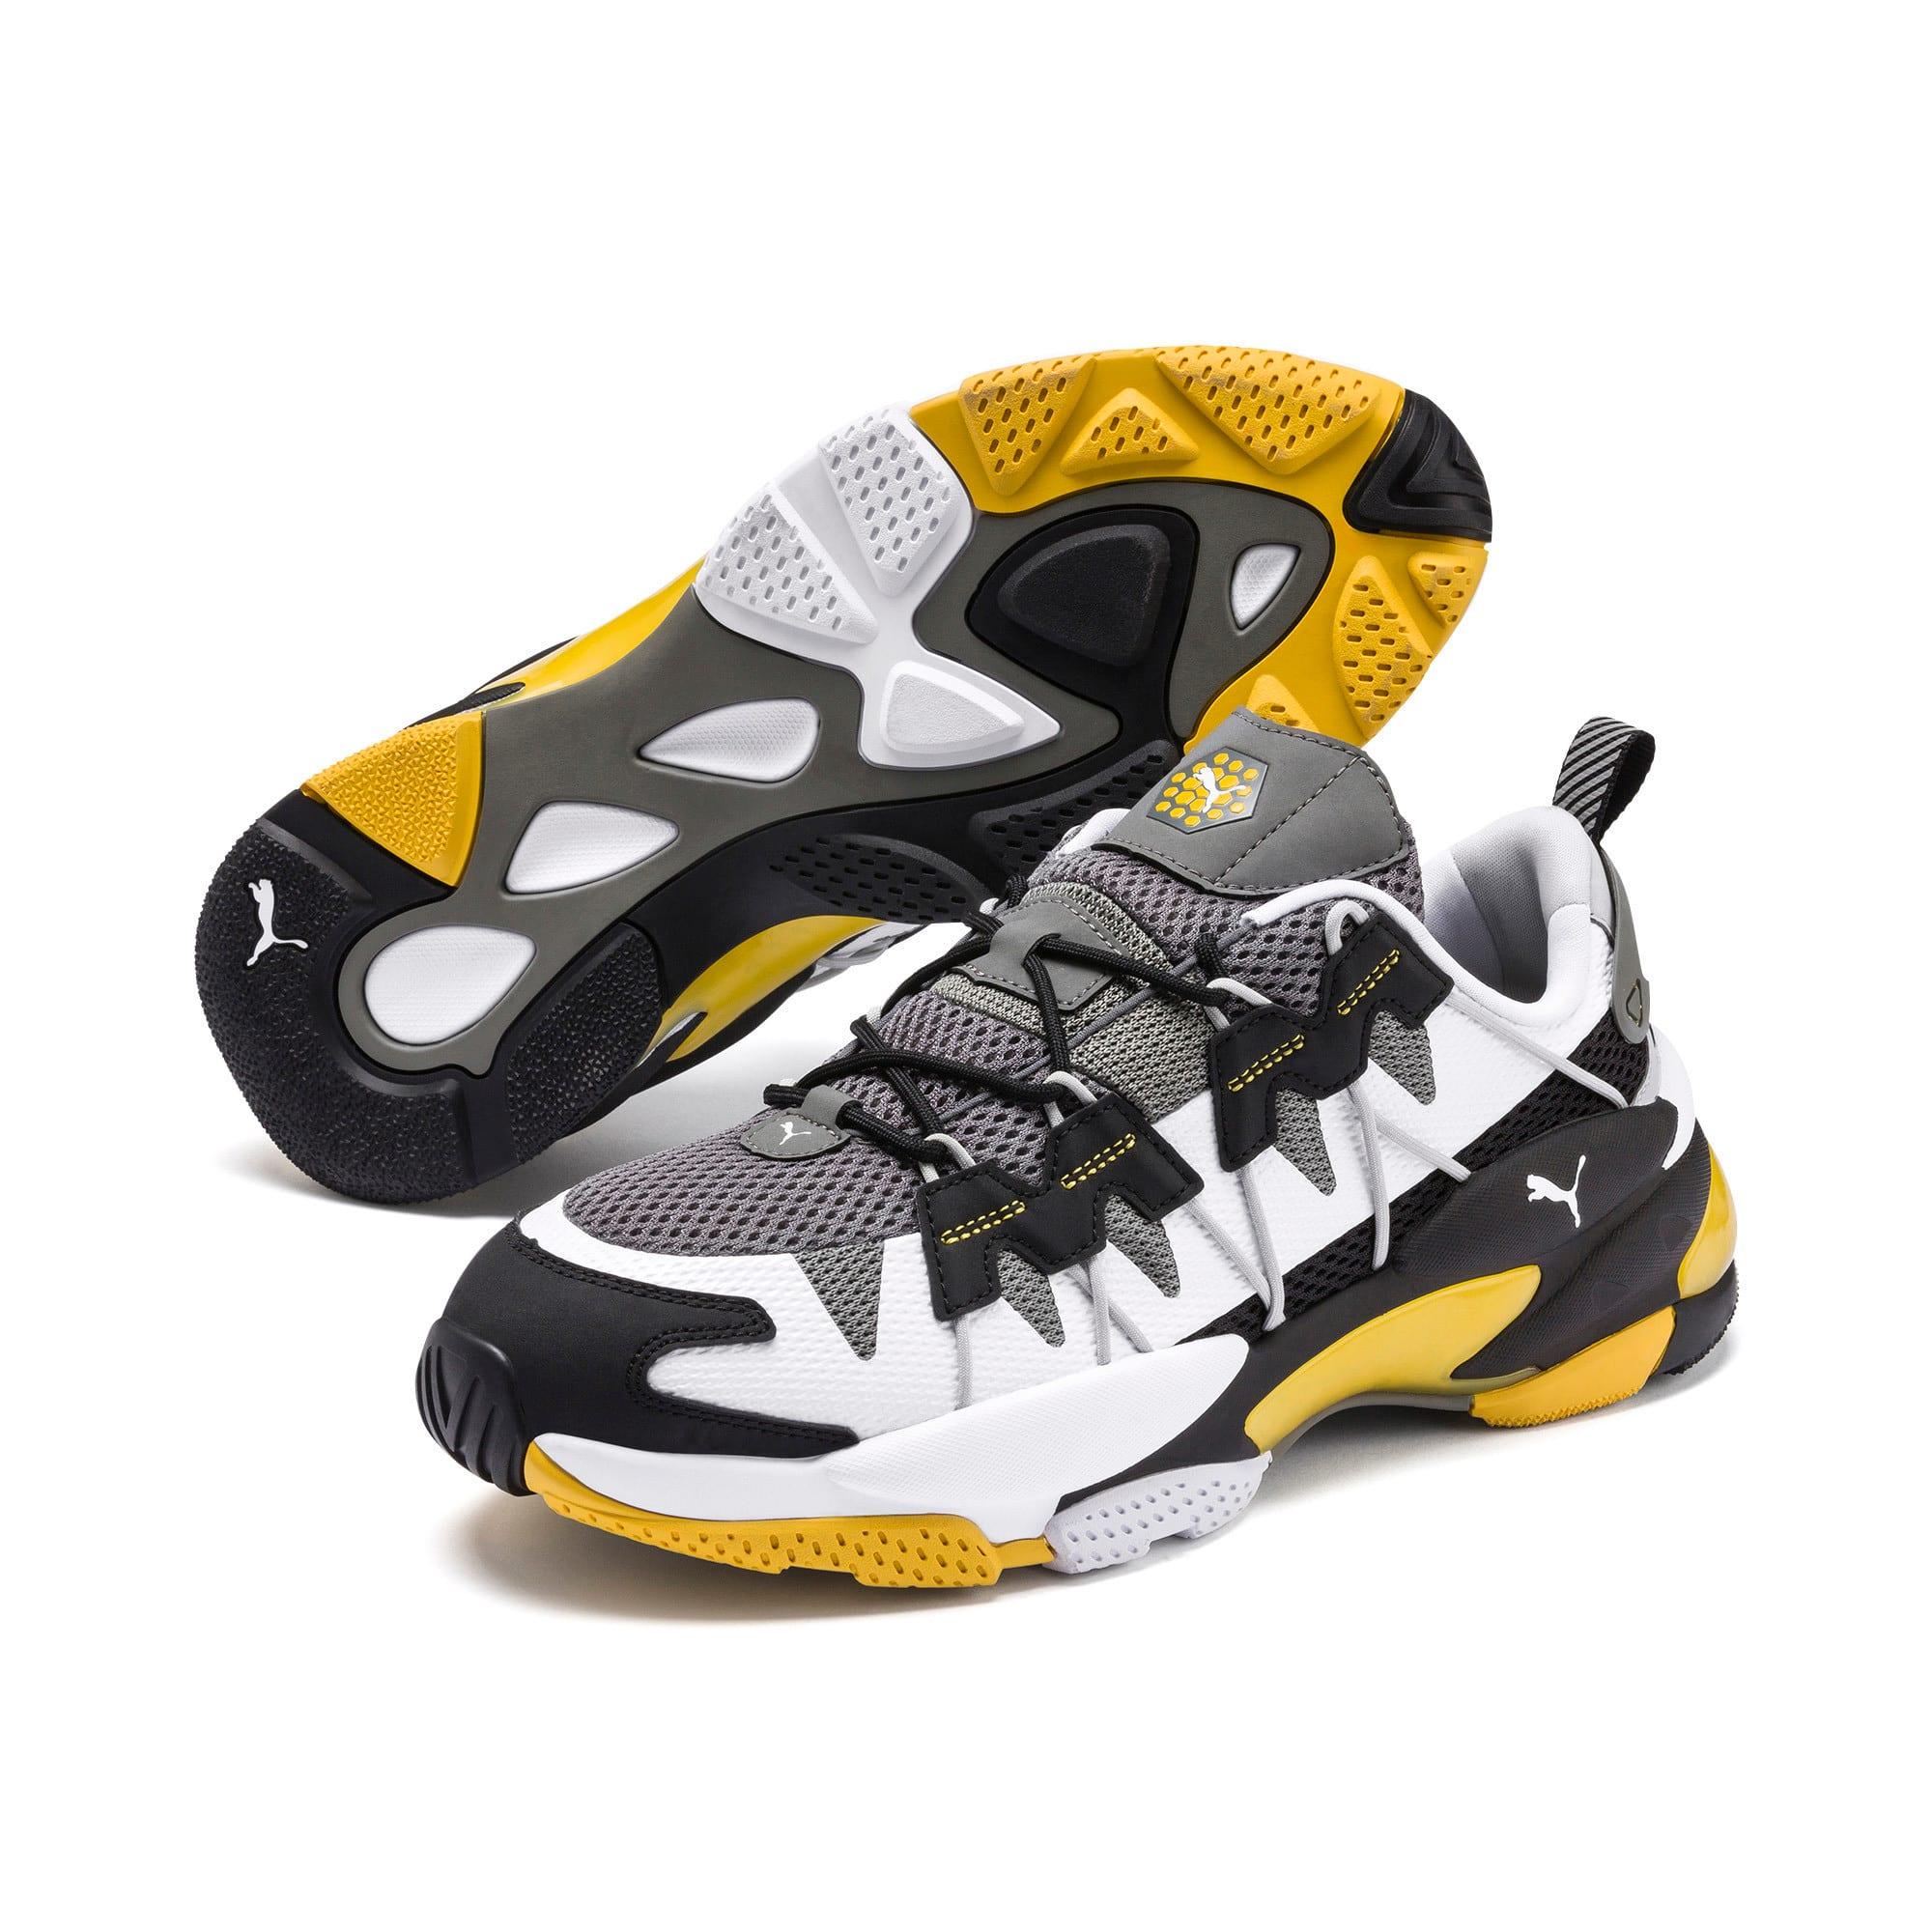 Thumbnail 2 of LQDCELL Omega Training Shoes, Puma Black-CASTLEROCK, medium